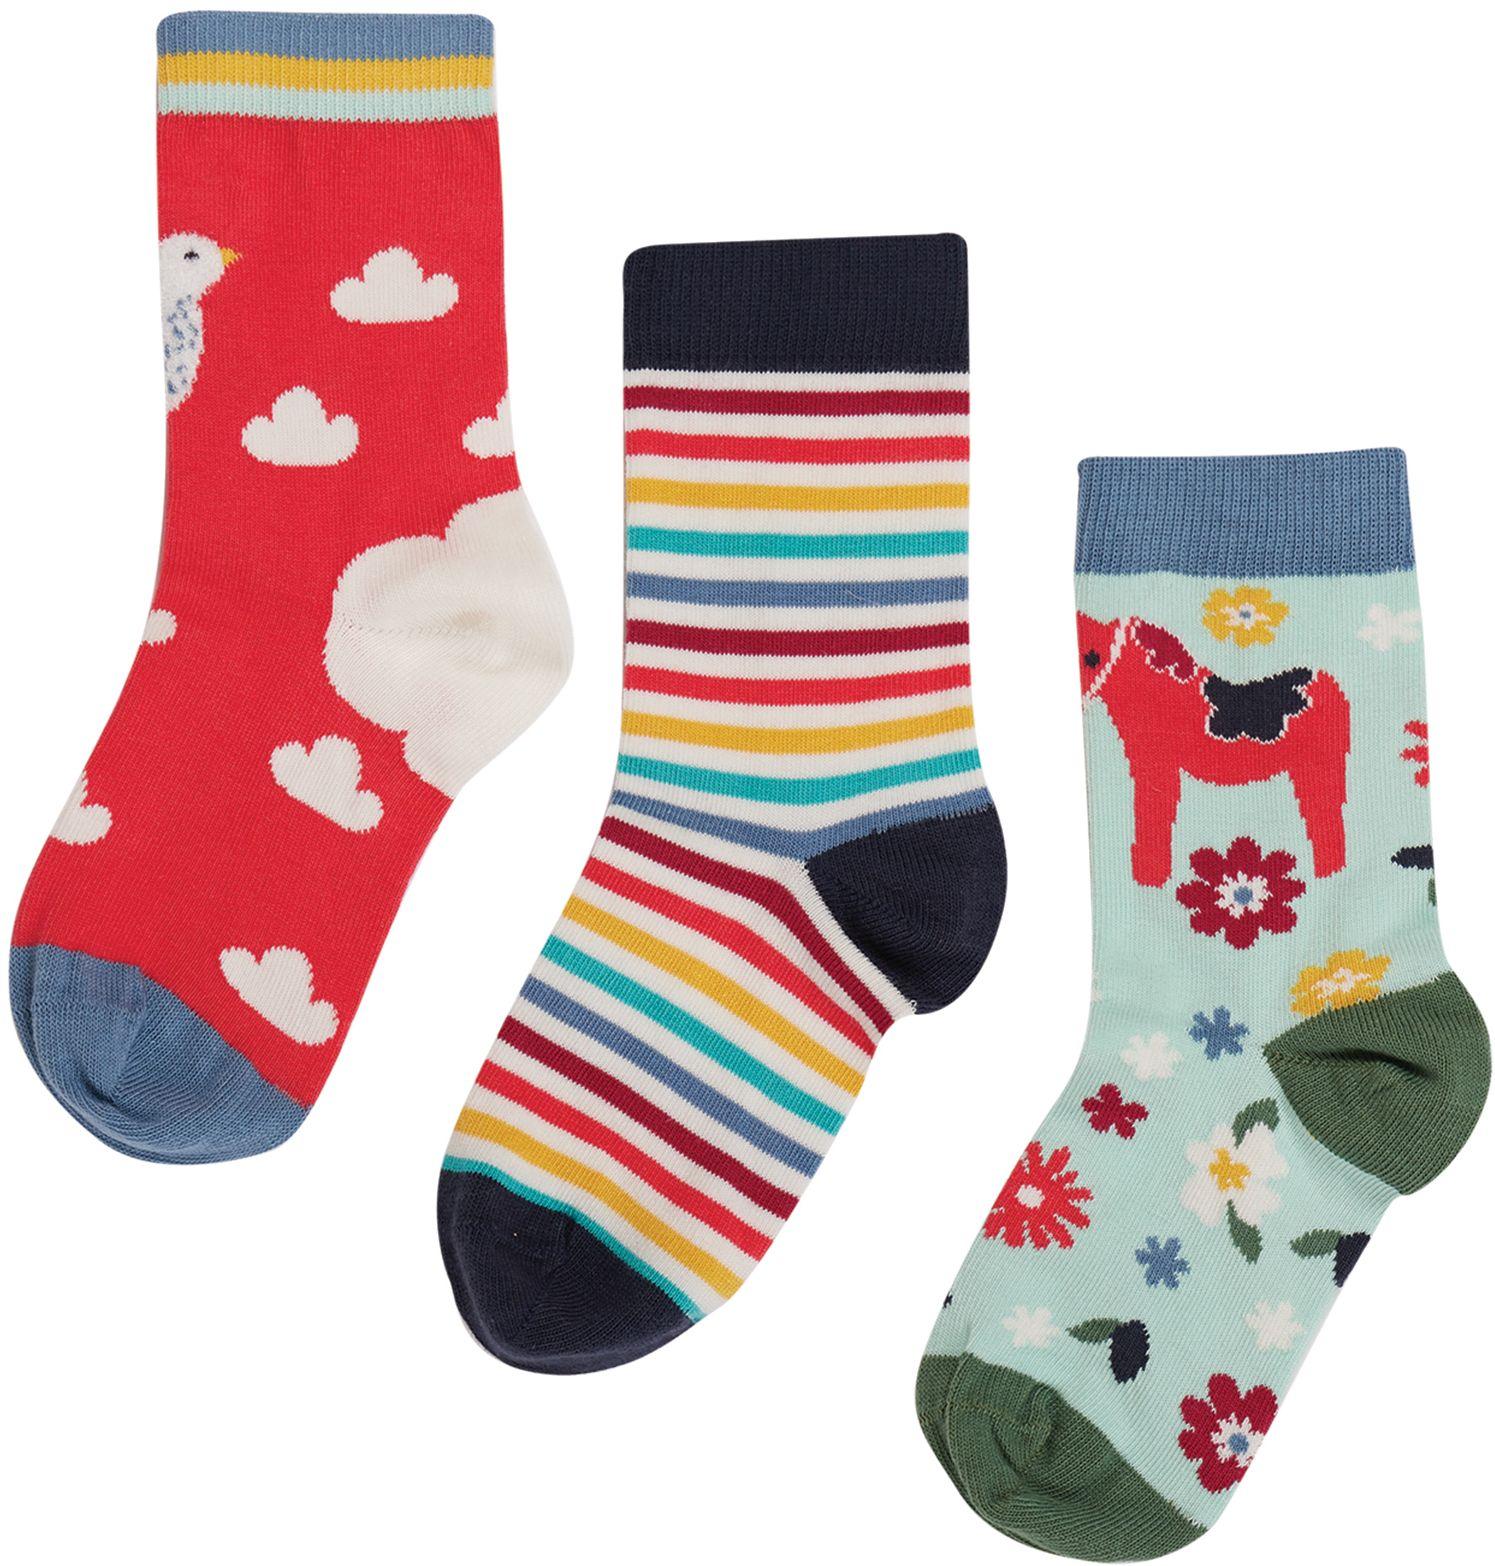 Gemusterte Kinder-Socken im 3er-Pack mit Pferd